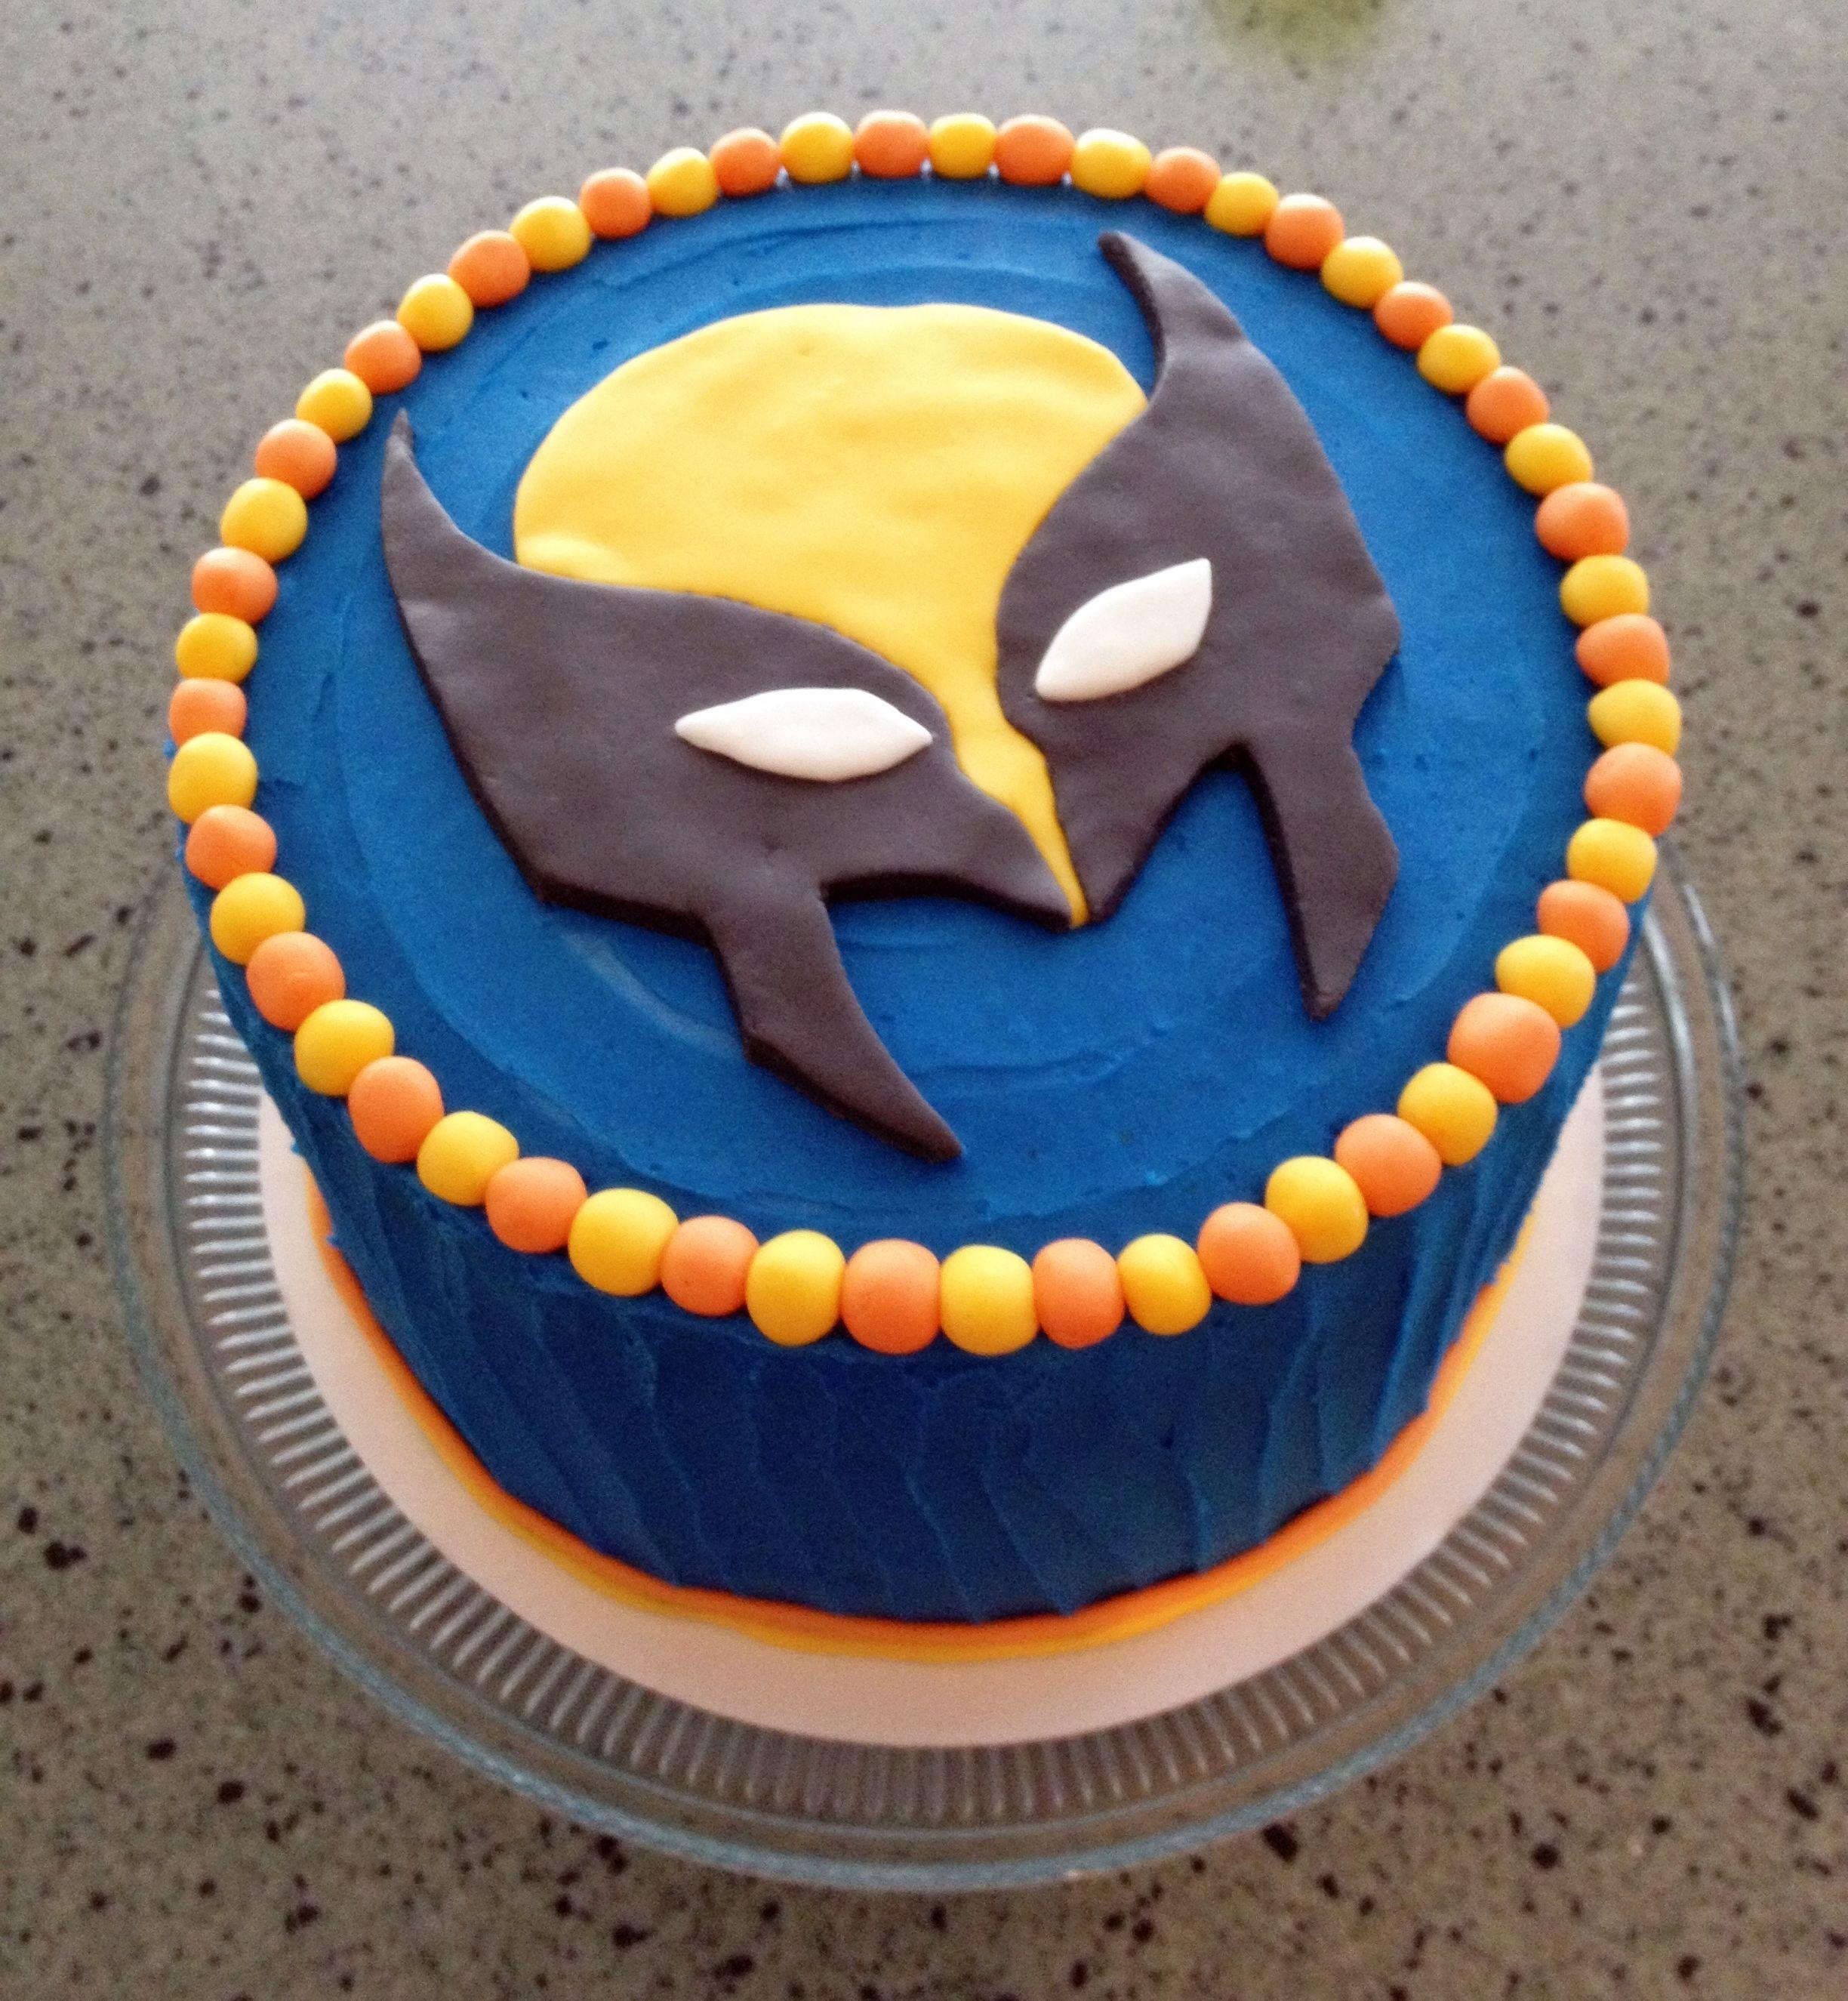 Magnificent Wolverine Or Superhero Birthday Cake Wolverine Cake Superhero Personalised Birthday Cards Veneteletsinfo